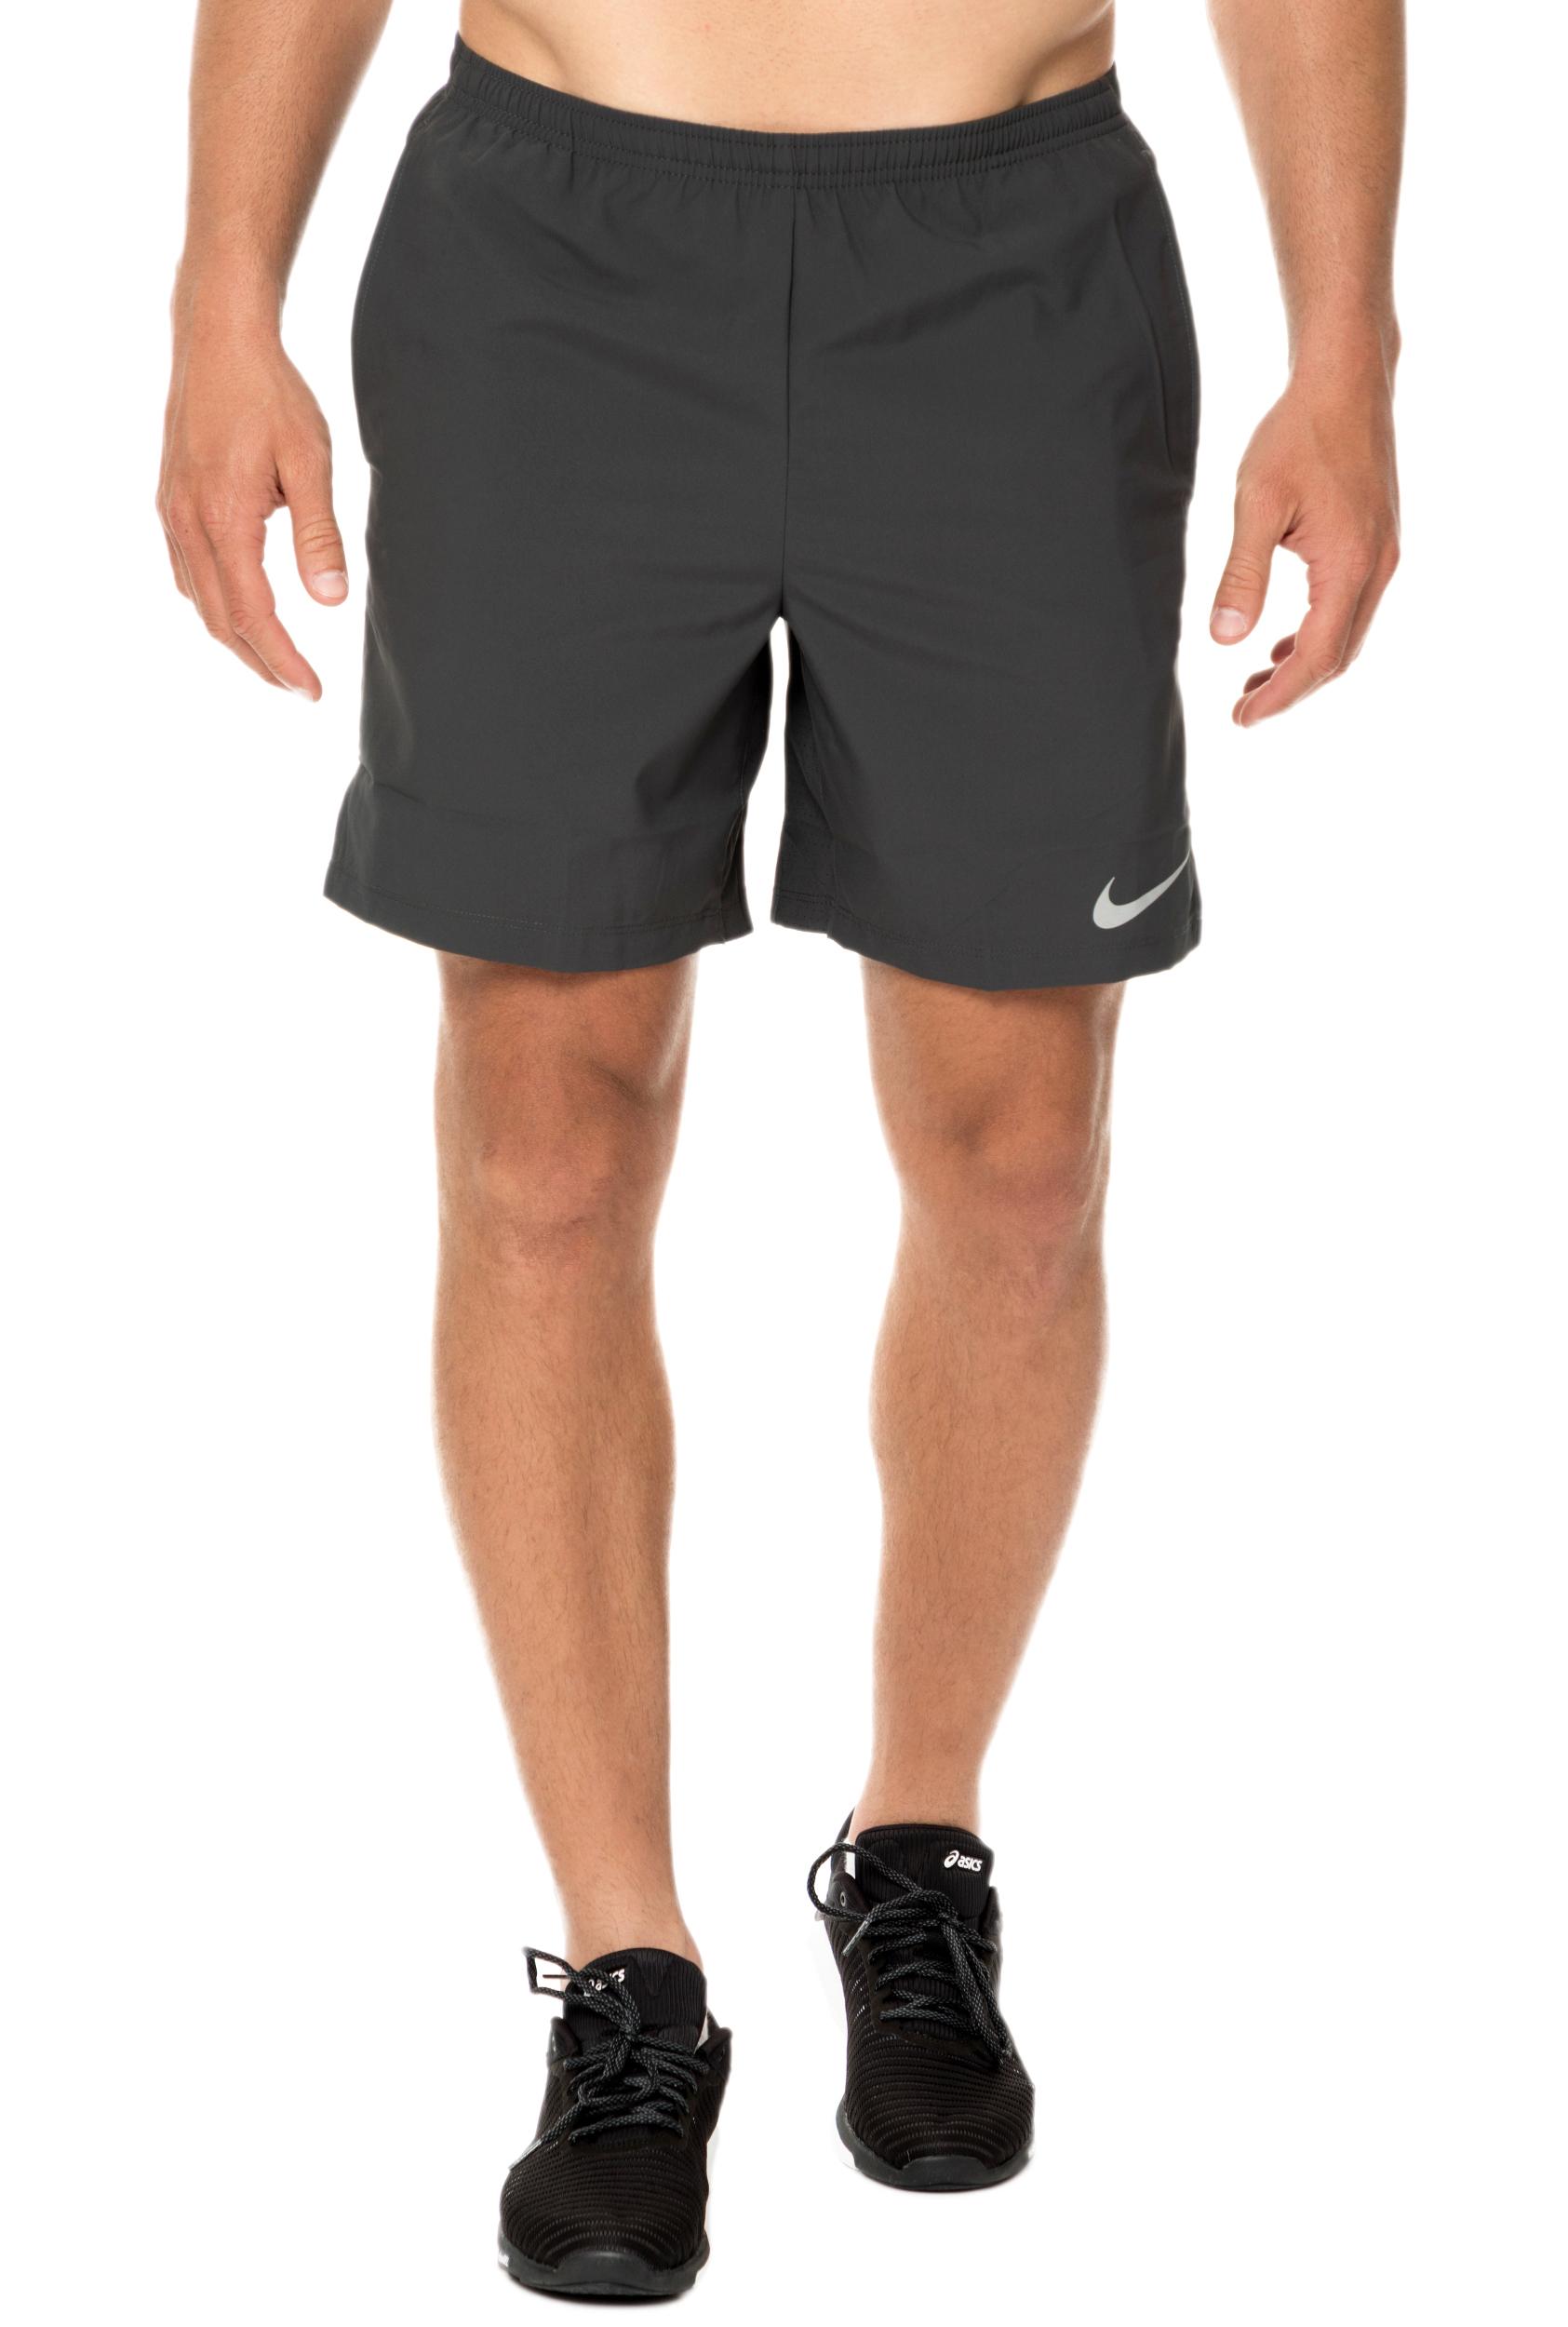 NIKE - Ανδρικό σορτς για τρέξιμο NΙKΕ FLΕX CHΑLLΕΝGΕR 7IN ανθρακί ανδρικά ρούχα σορτς βερμούδες casual jean